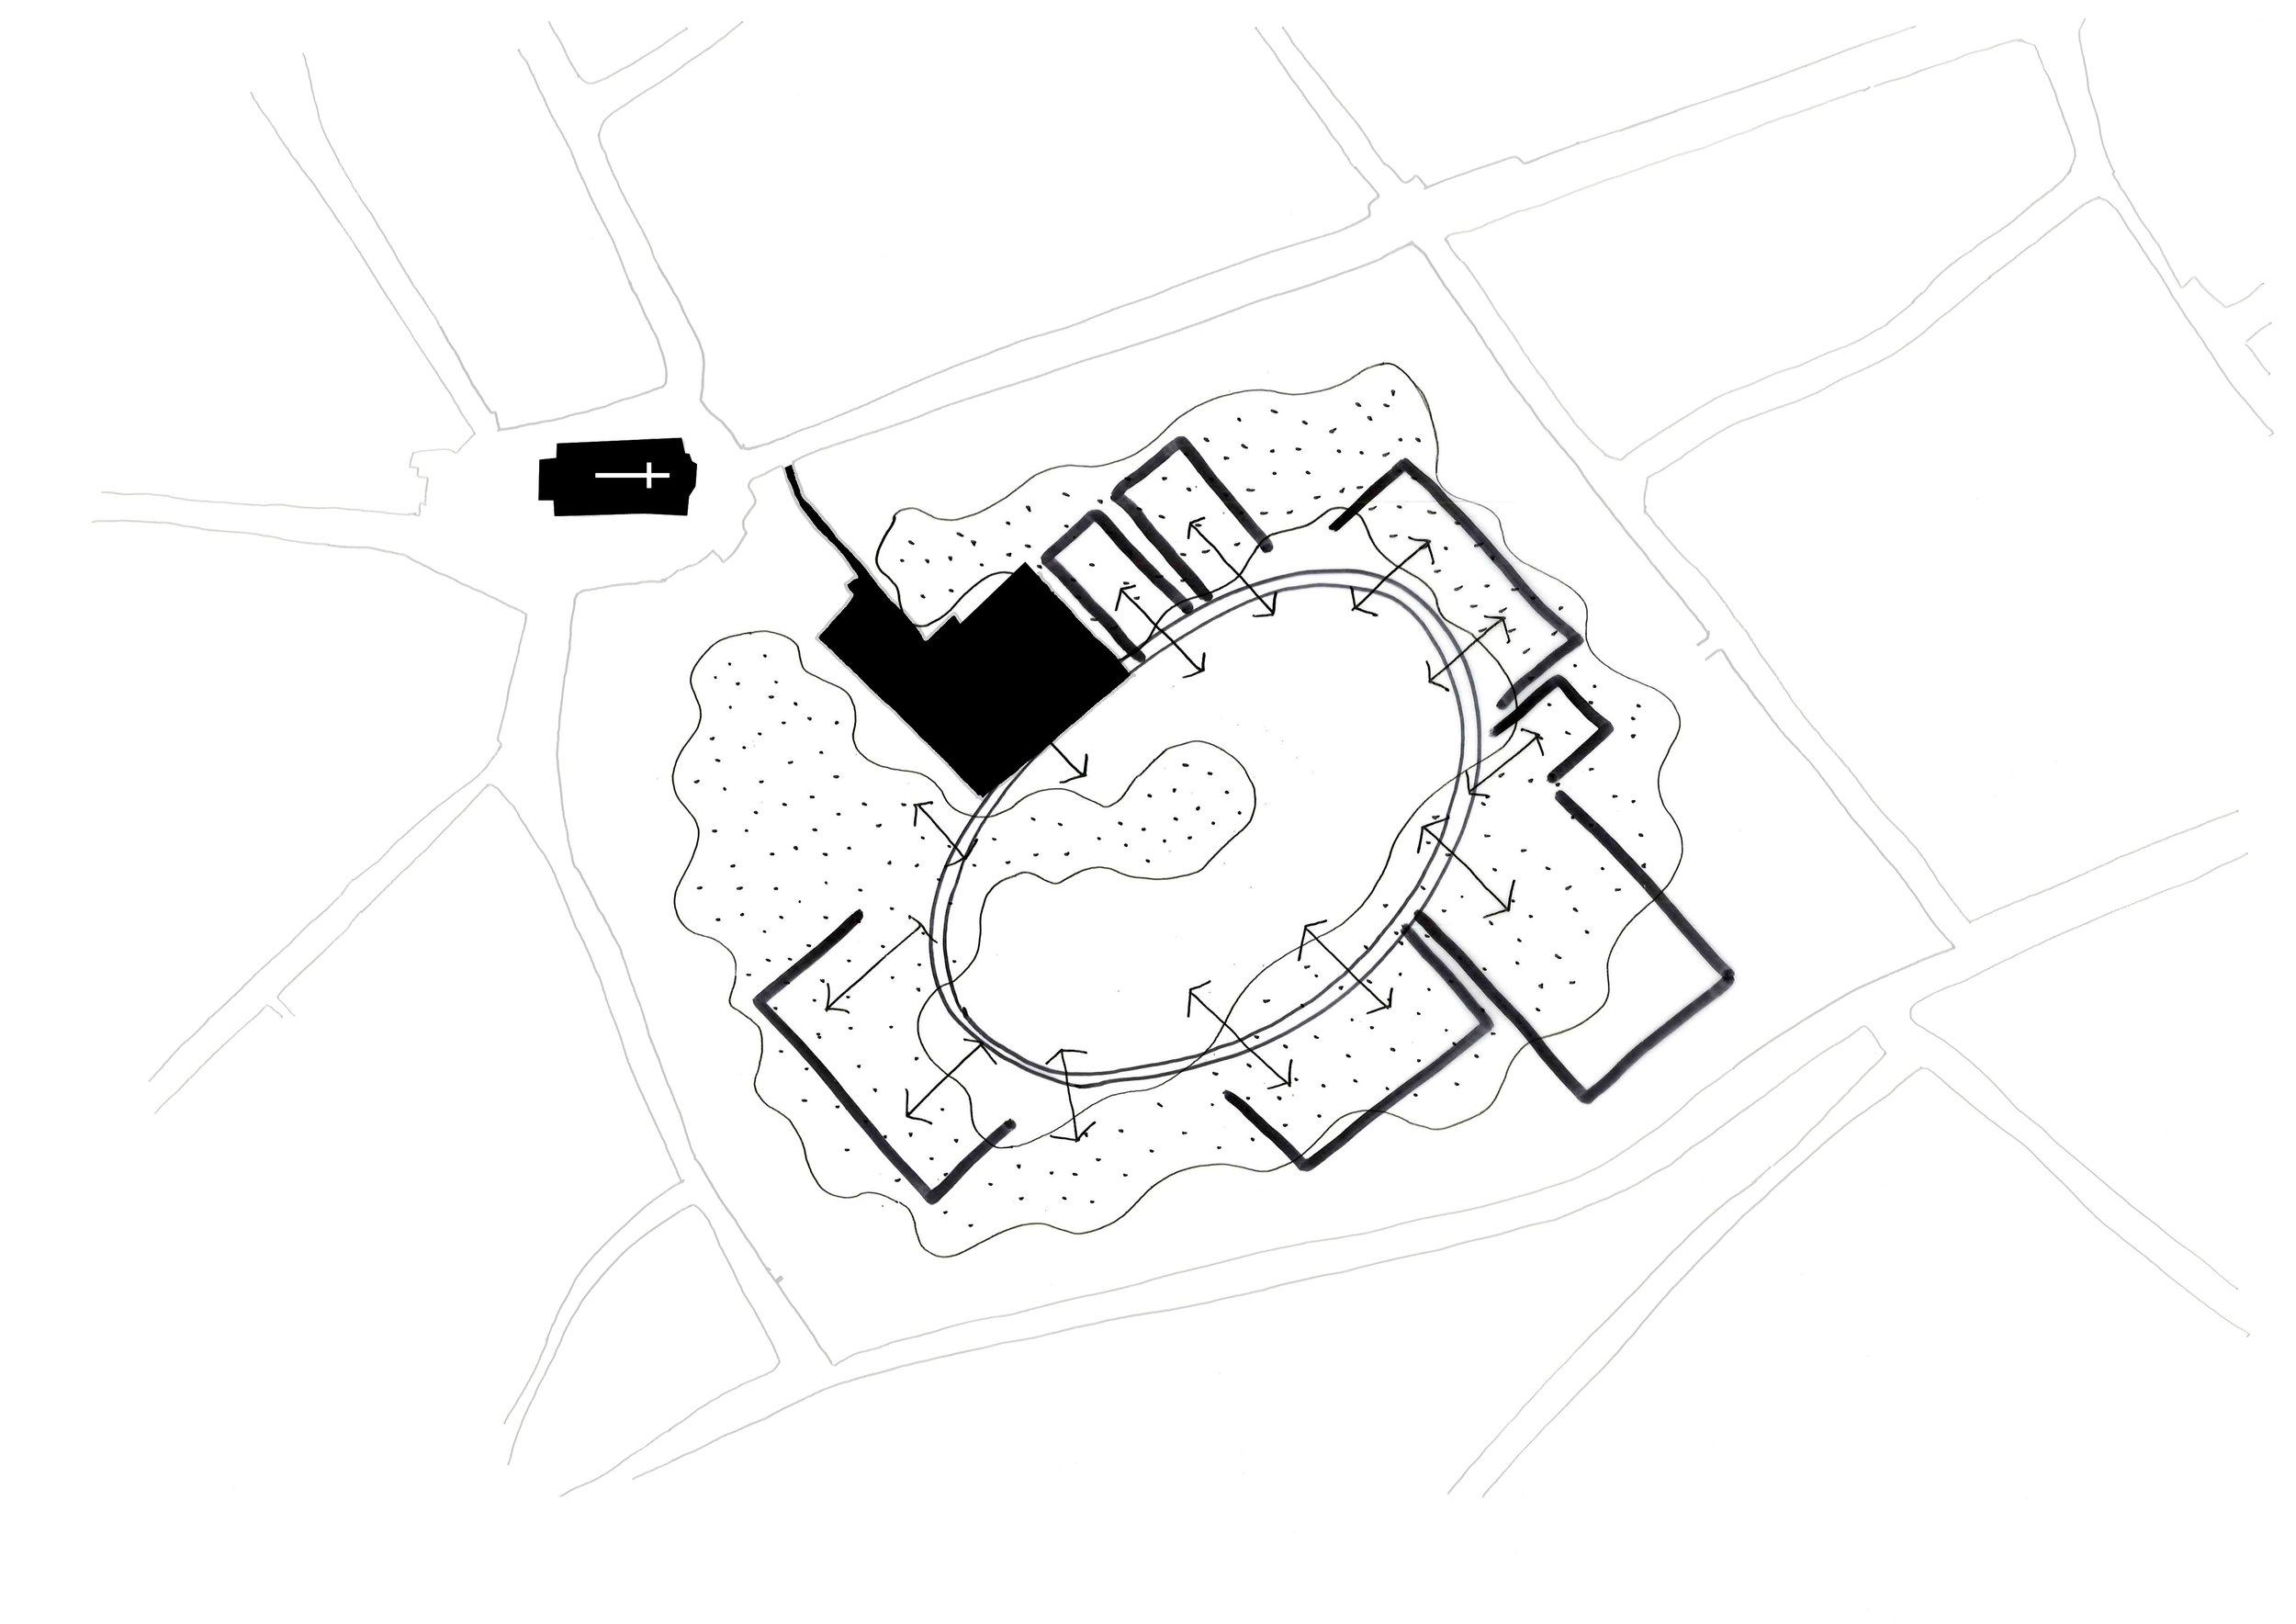 DHOOGE&MEGANCK-ZOMERGEM-MP1.jpg